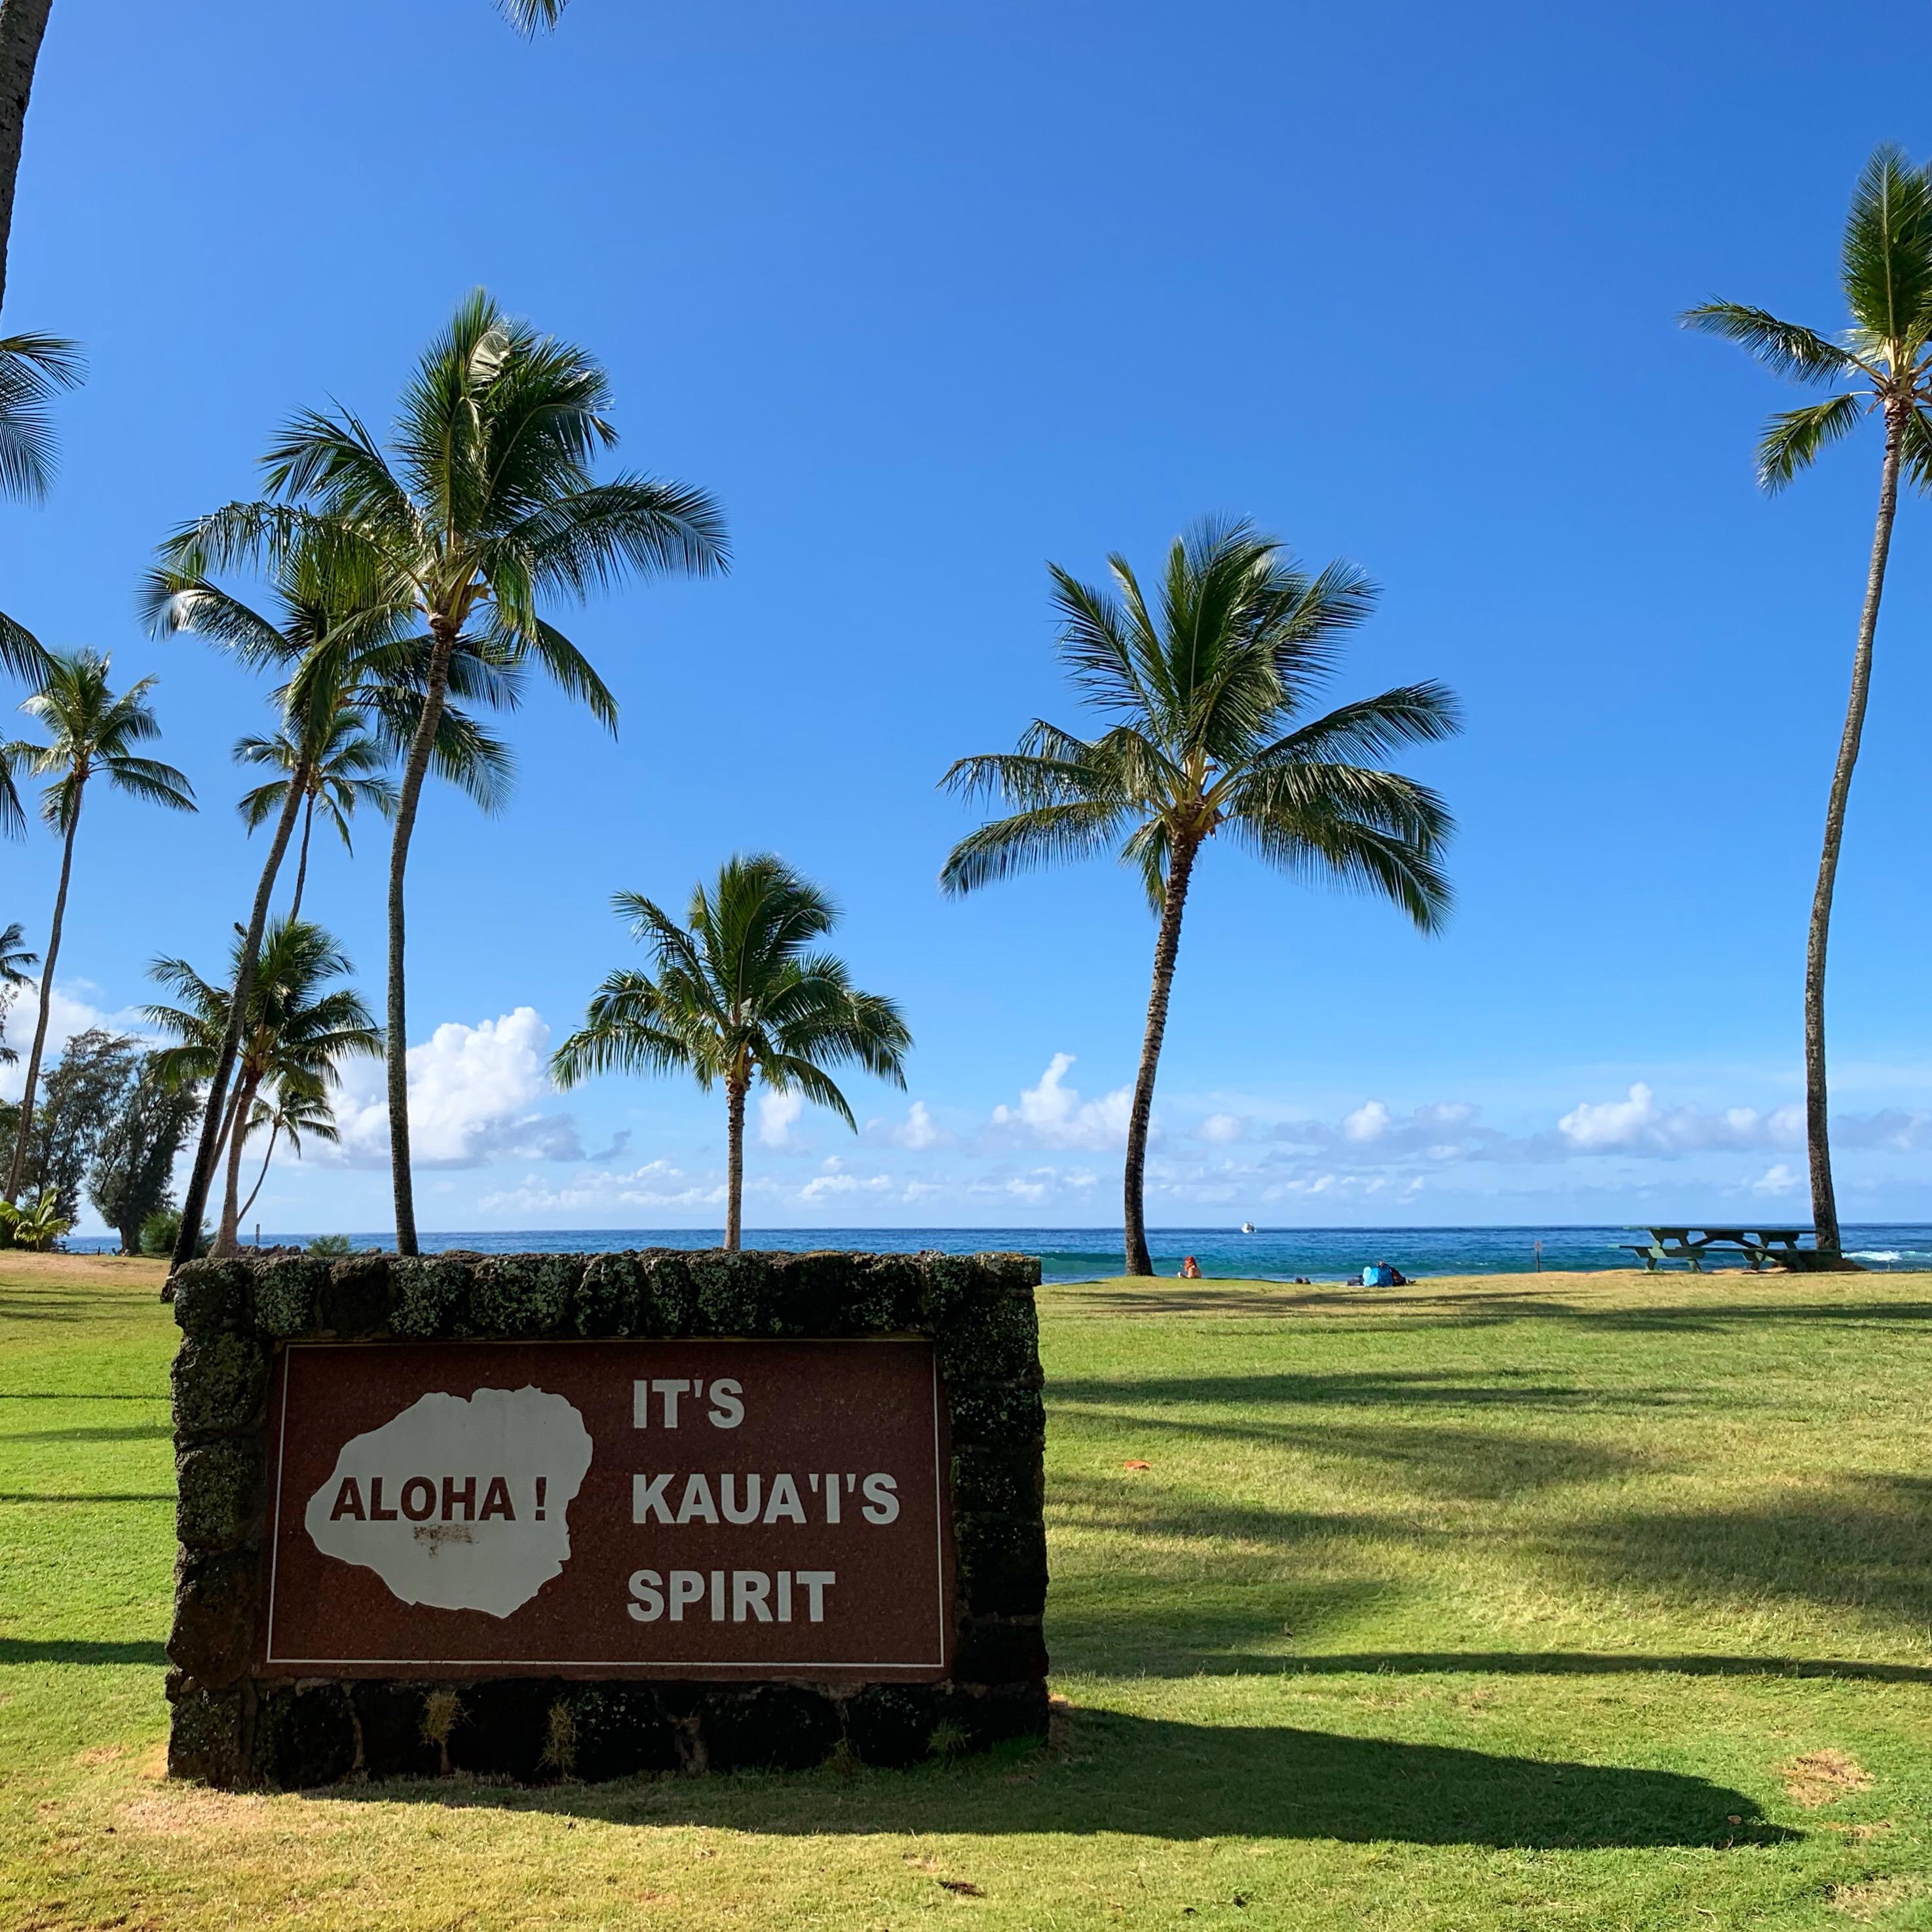 Aloha! It's Kaua'i's Spirit! (Poipu Beach Park)